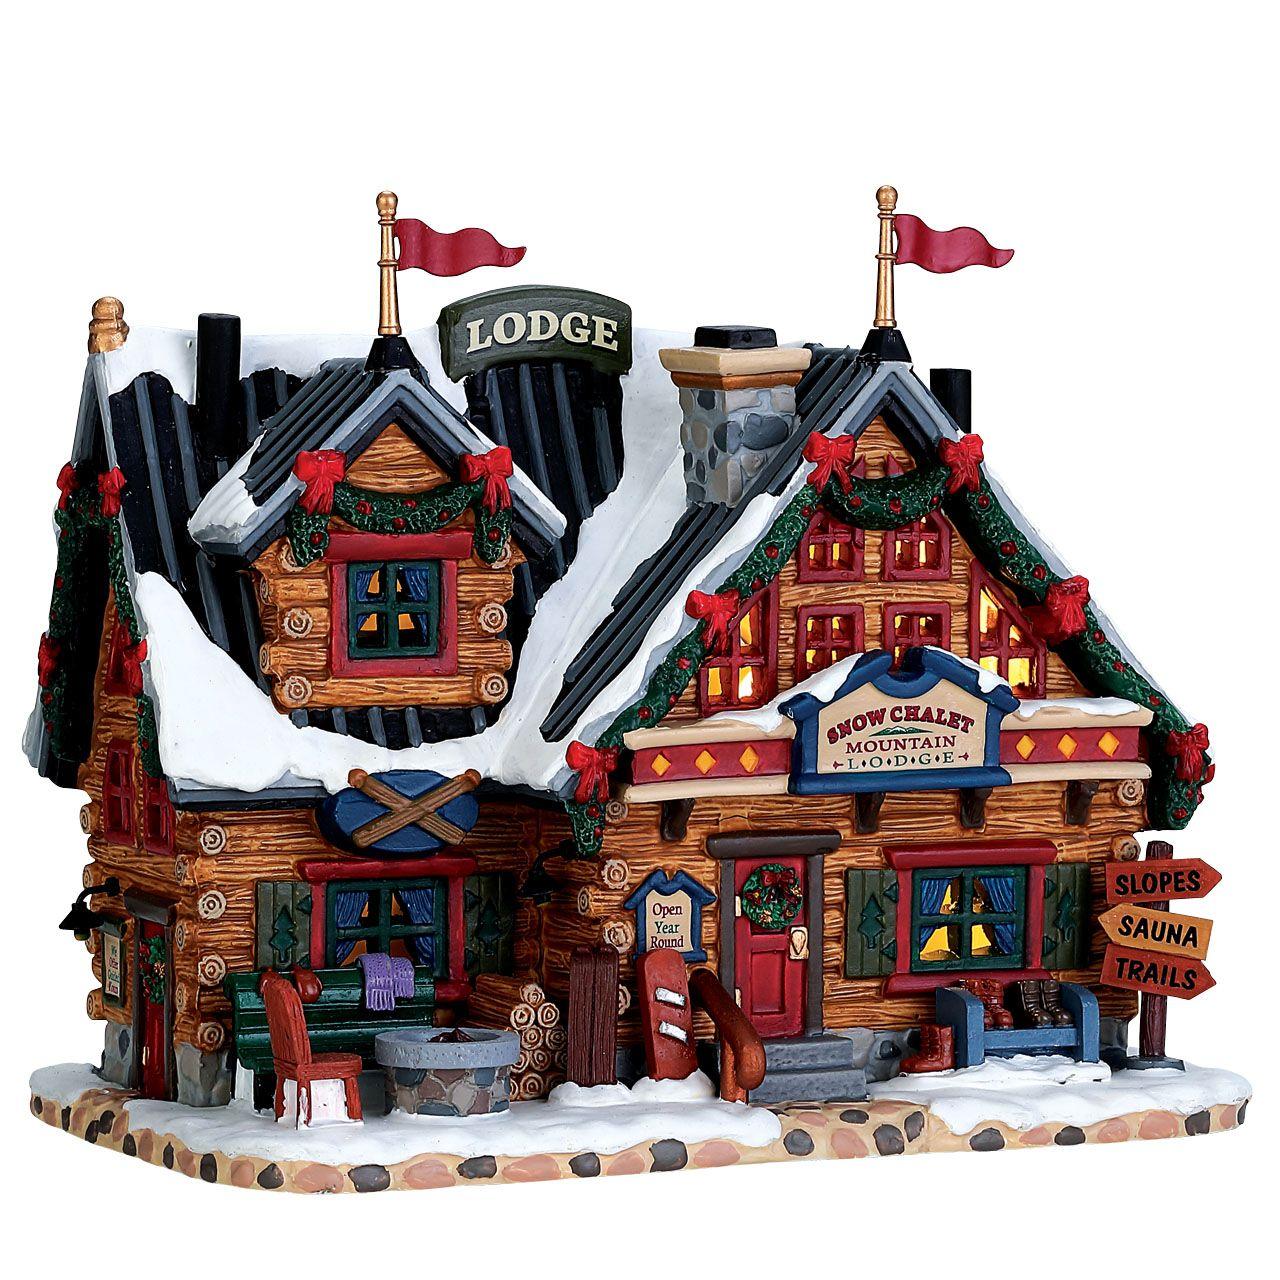 Lemax Apres-Ski Lodge verlicht kersthuisje Vail Village 2017 - Lemax ...